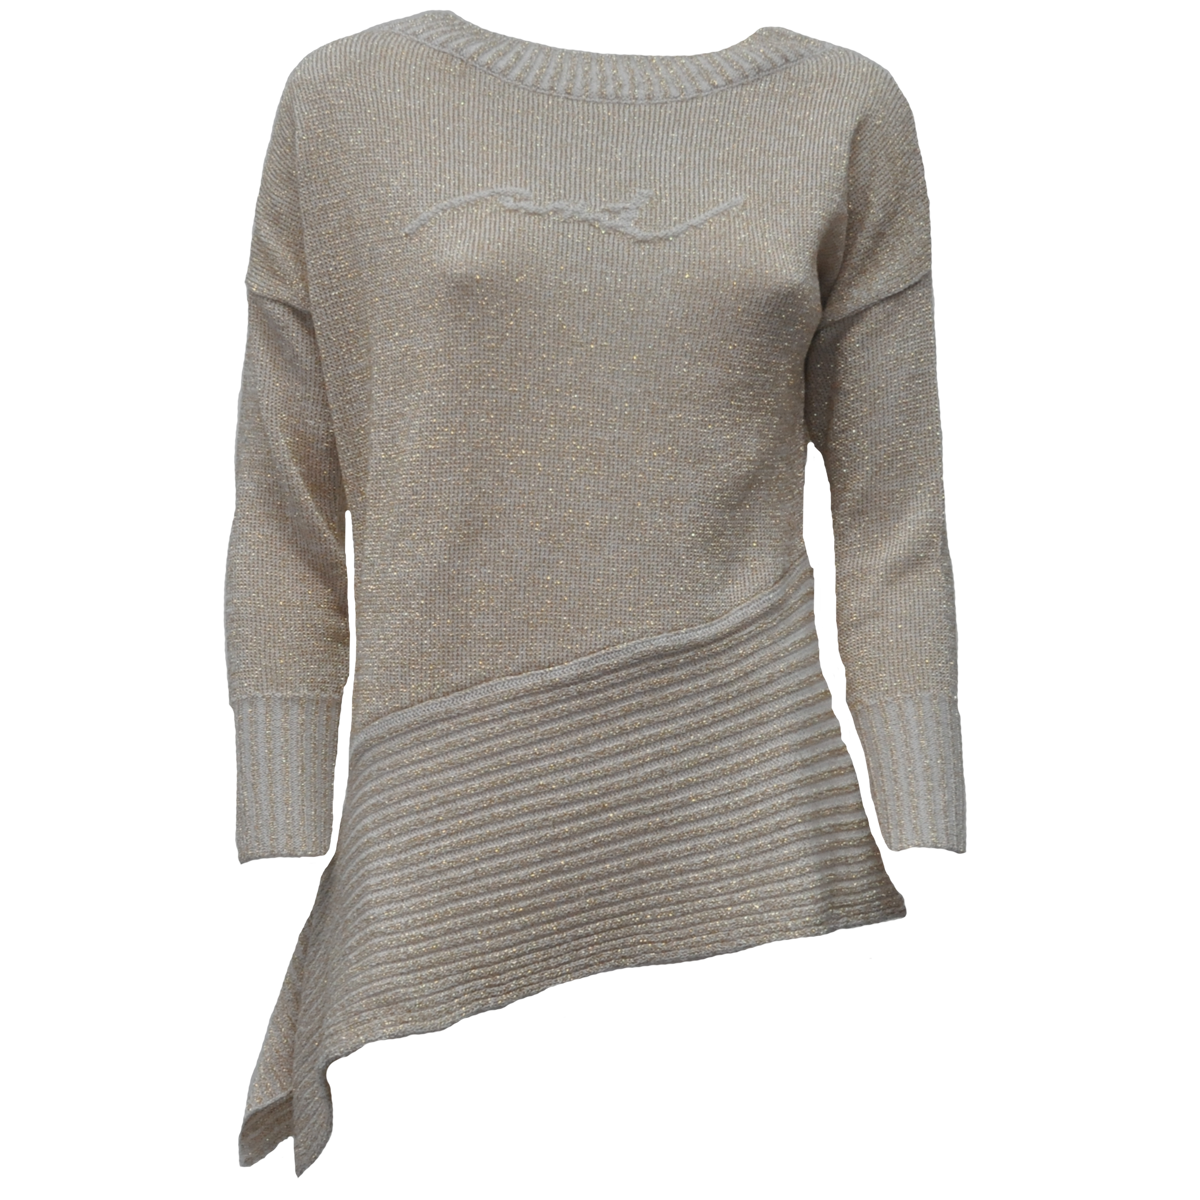 Shiny_-_zenski_-_pulover_-_9.png